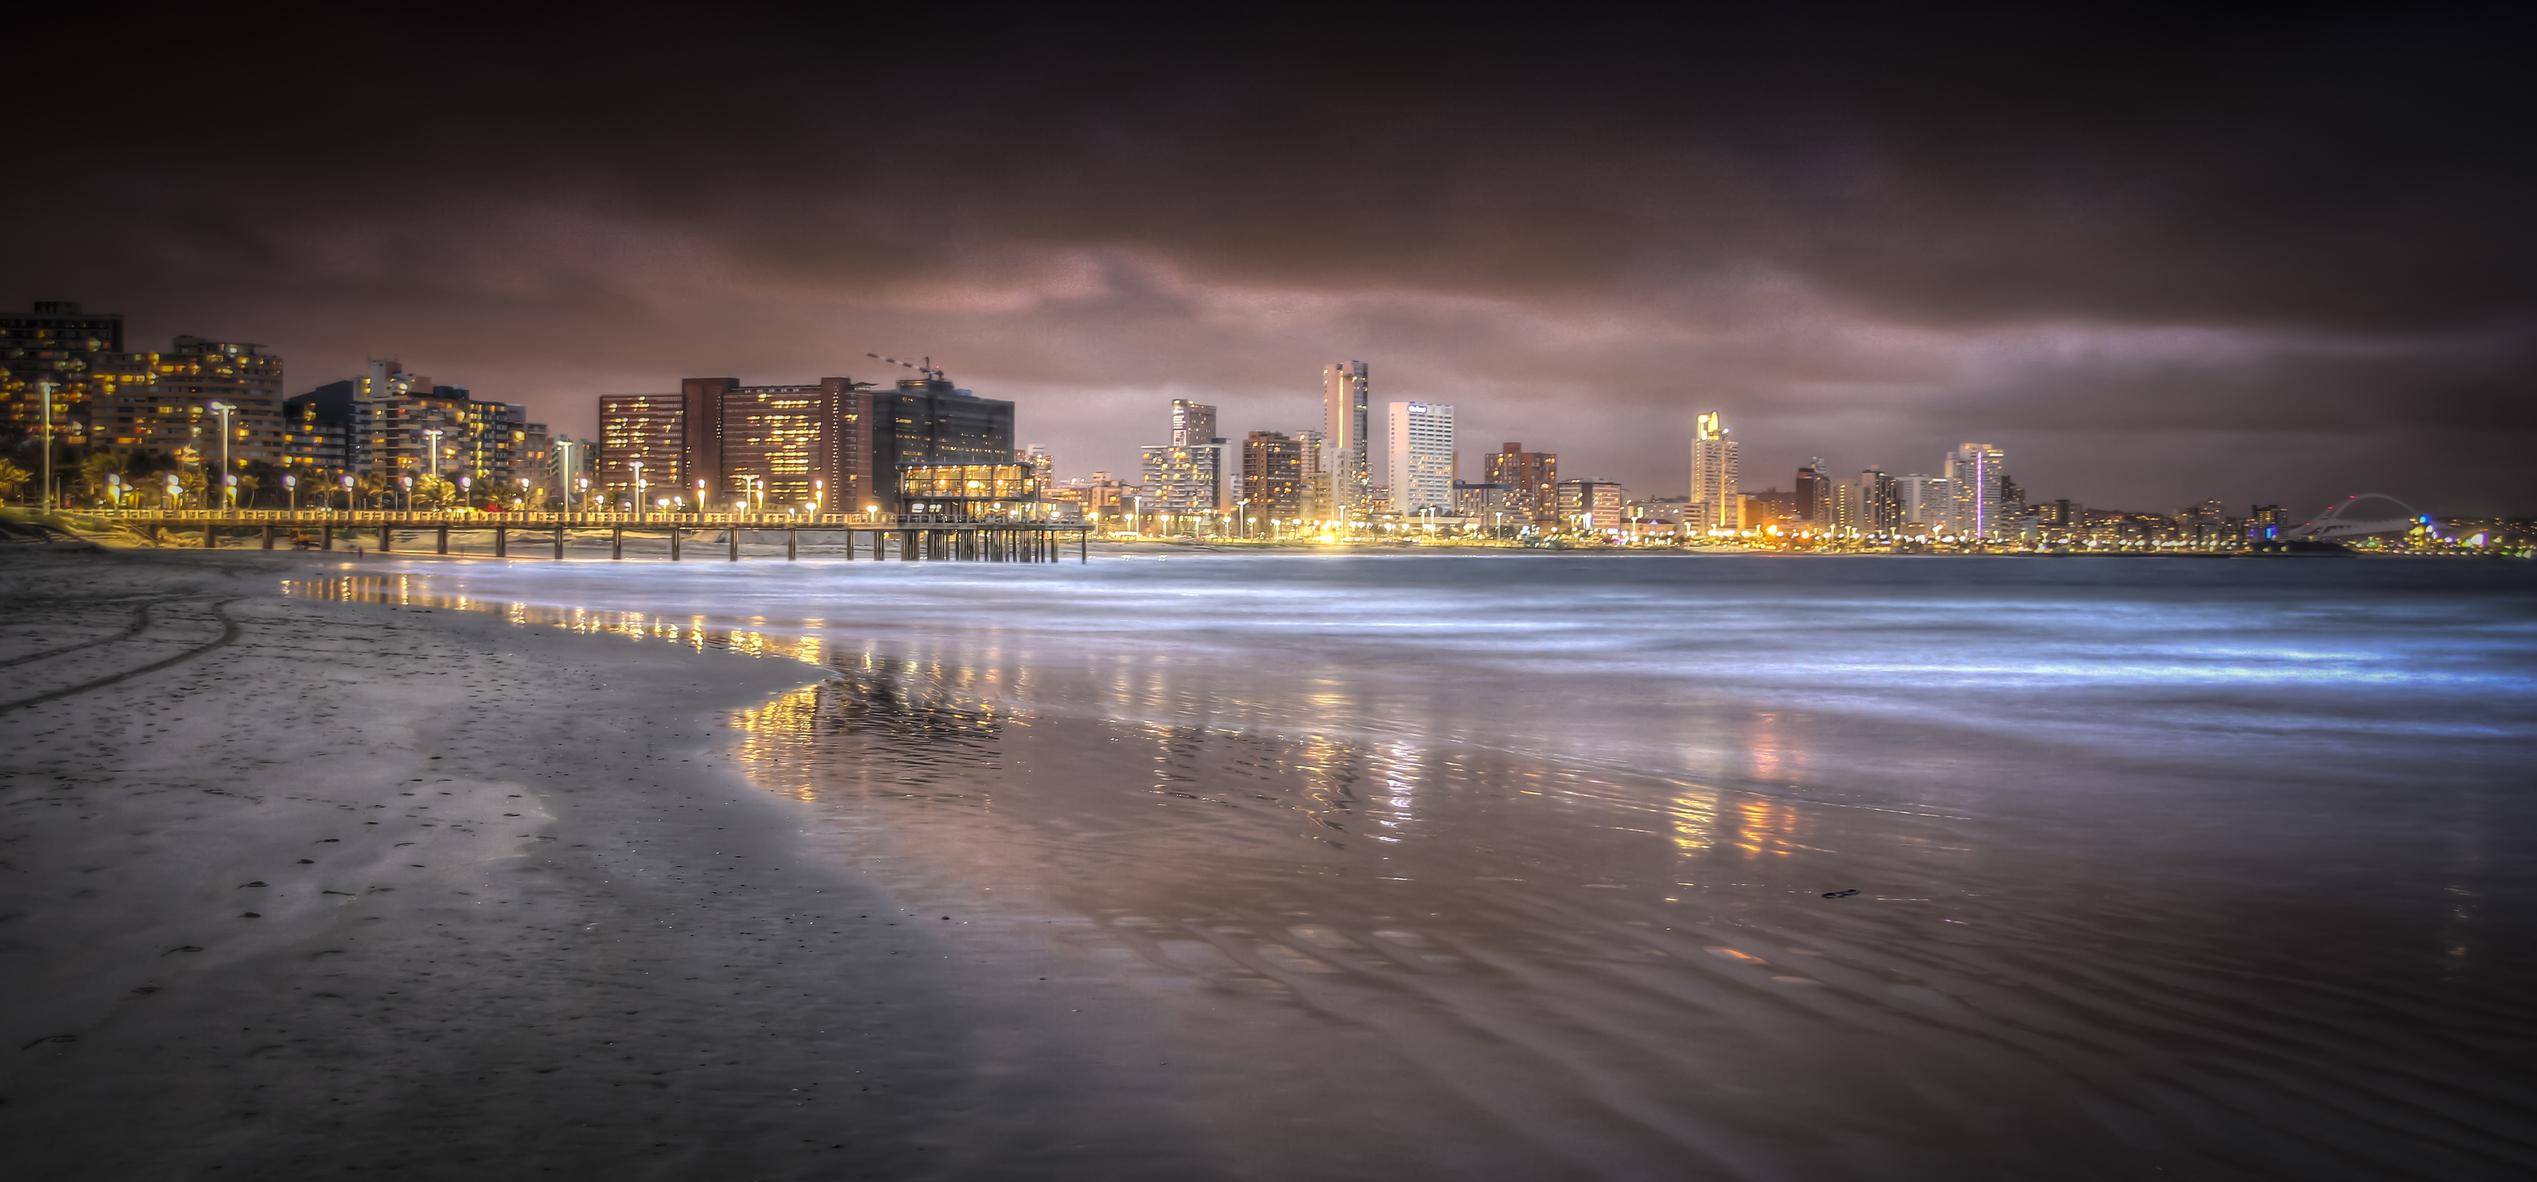 Image: iStock - Durban, KwaZulu-Natal South Africa.